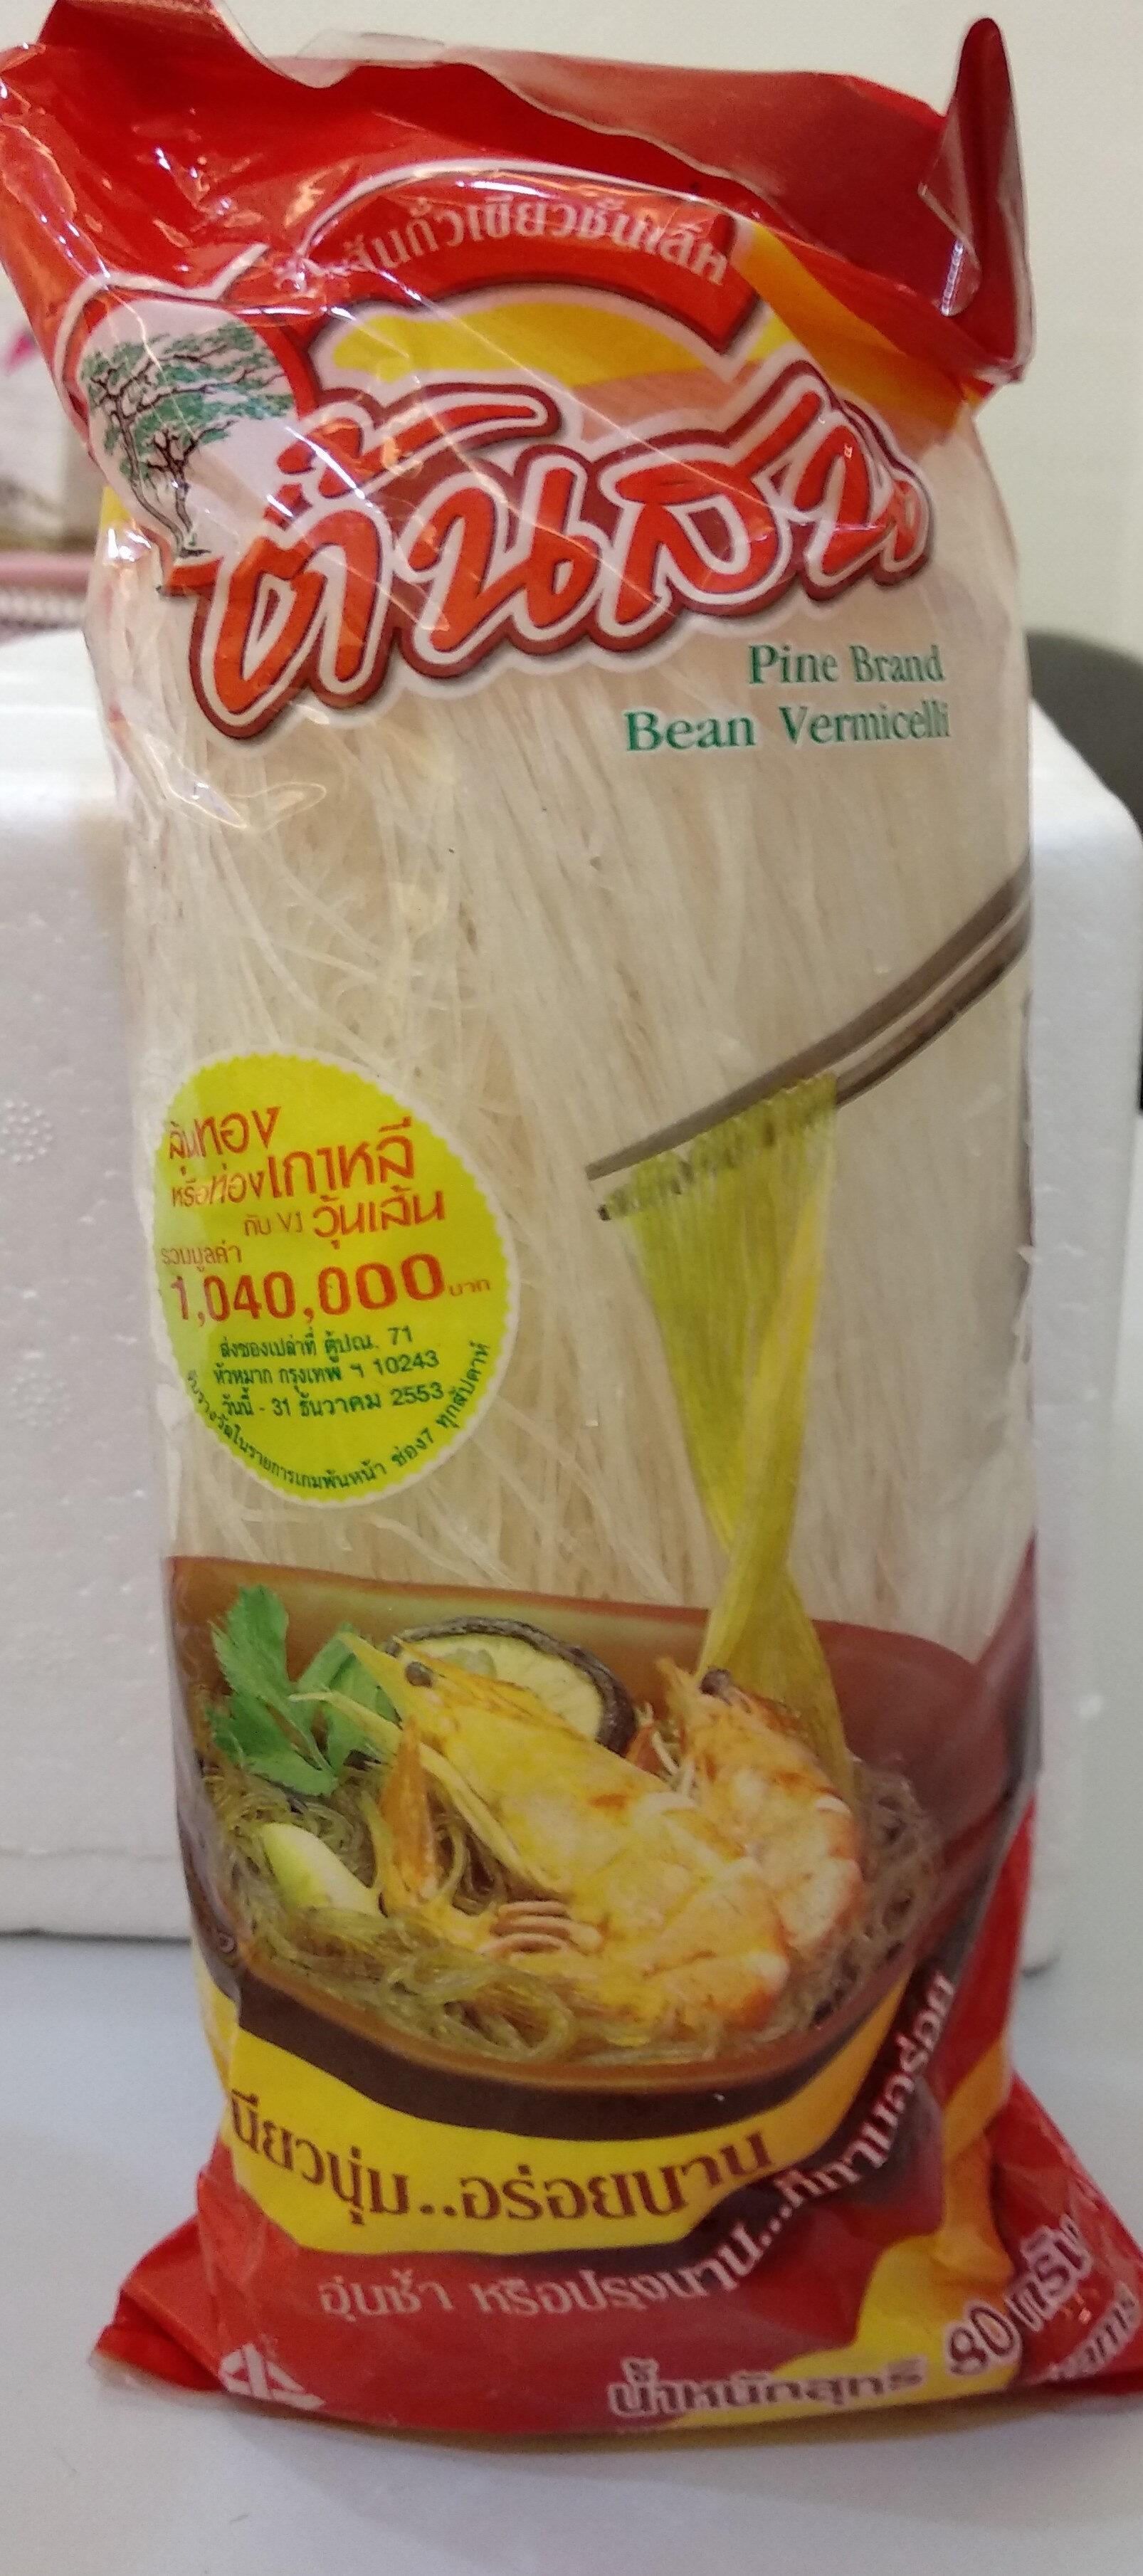 Pine Brand Bean Vermicelli 80G - Product - th